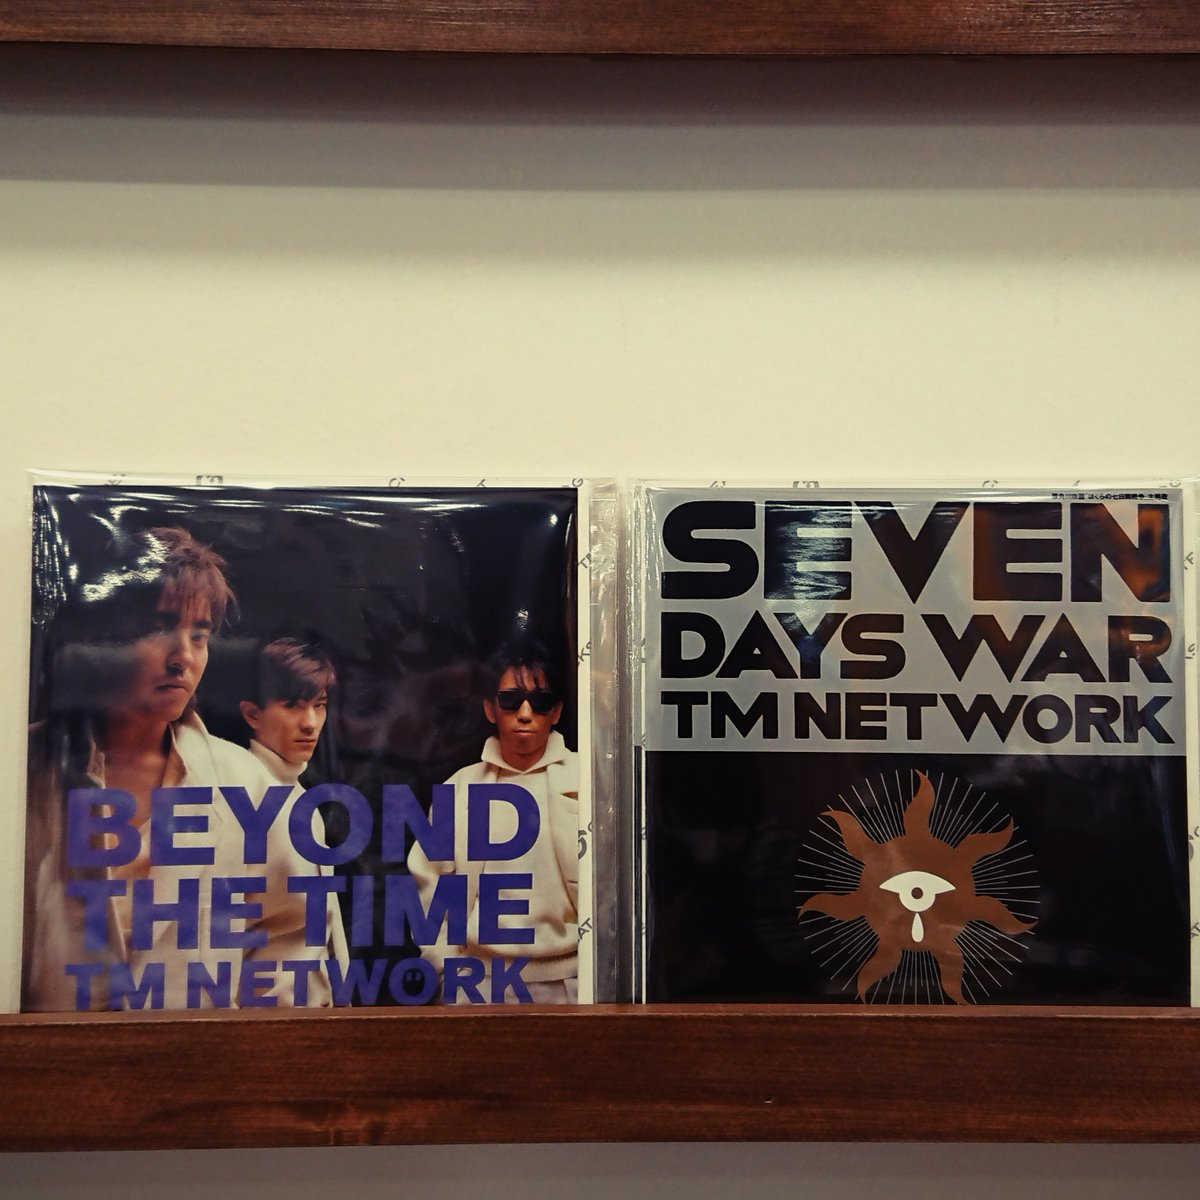 【#TMNETWORK】#TMネットワーク、88年の大ヒットシングル「BEYOND THE TIME (メビウスの宇宙を越えて)」と「SEVEN DAYS WAR」がアナログ7inch完全生産限定盤で復刻リリース!入荷しました!!!#towervinyl #GreatTracks